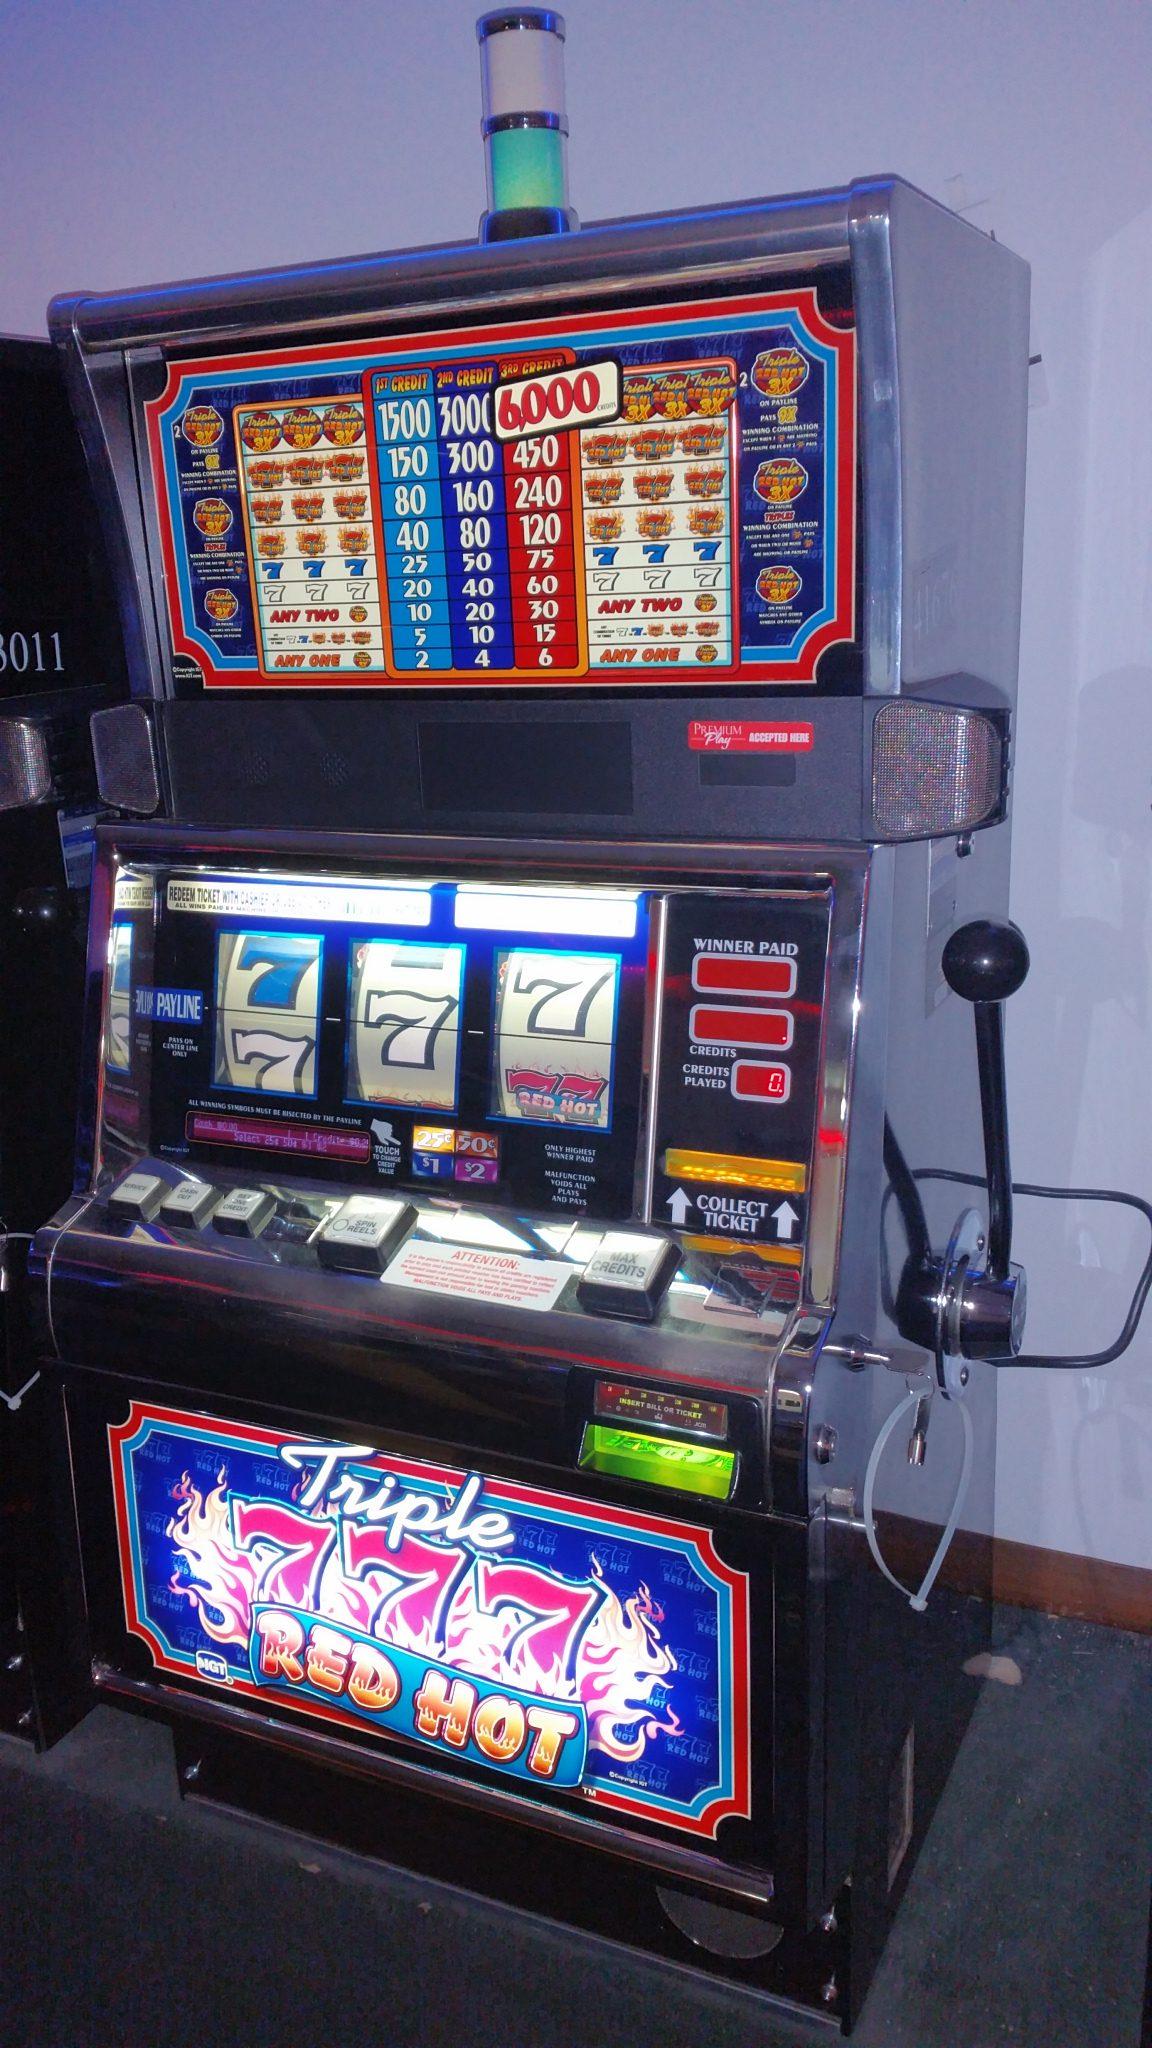 IGT S2000 Triple 777 Red Hot 3 Reel Slot Machine